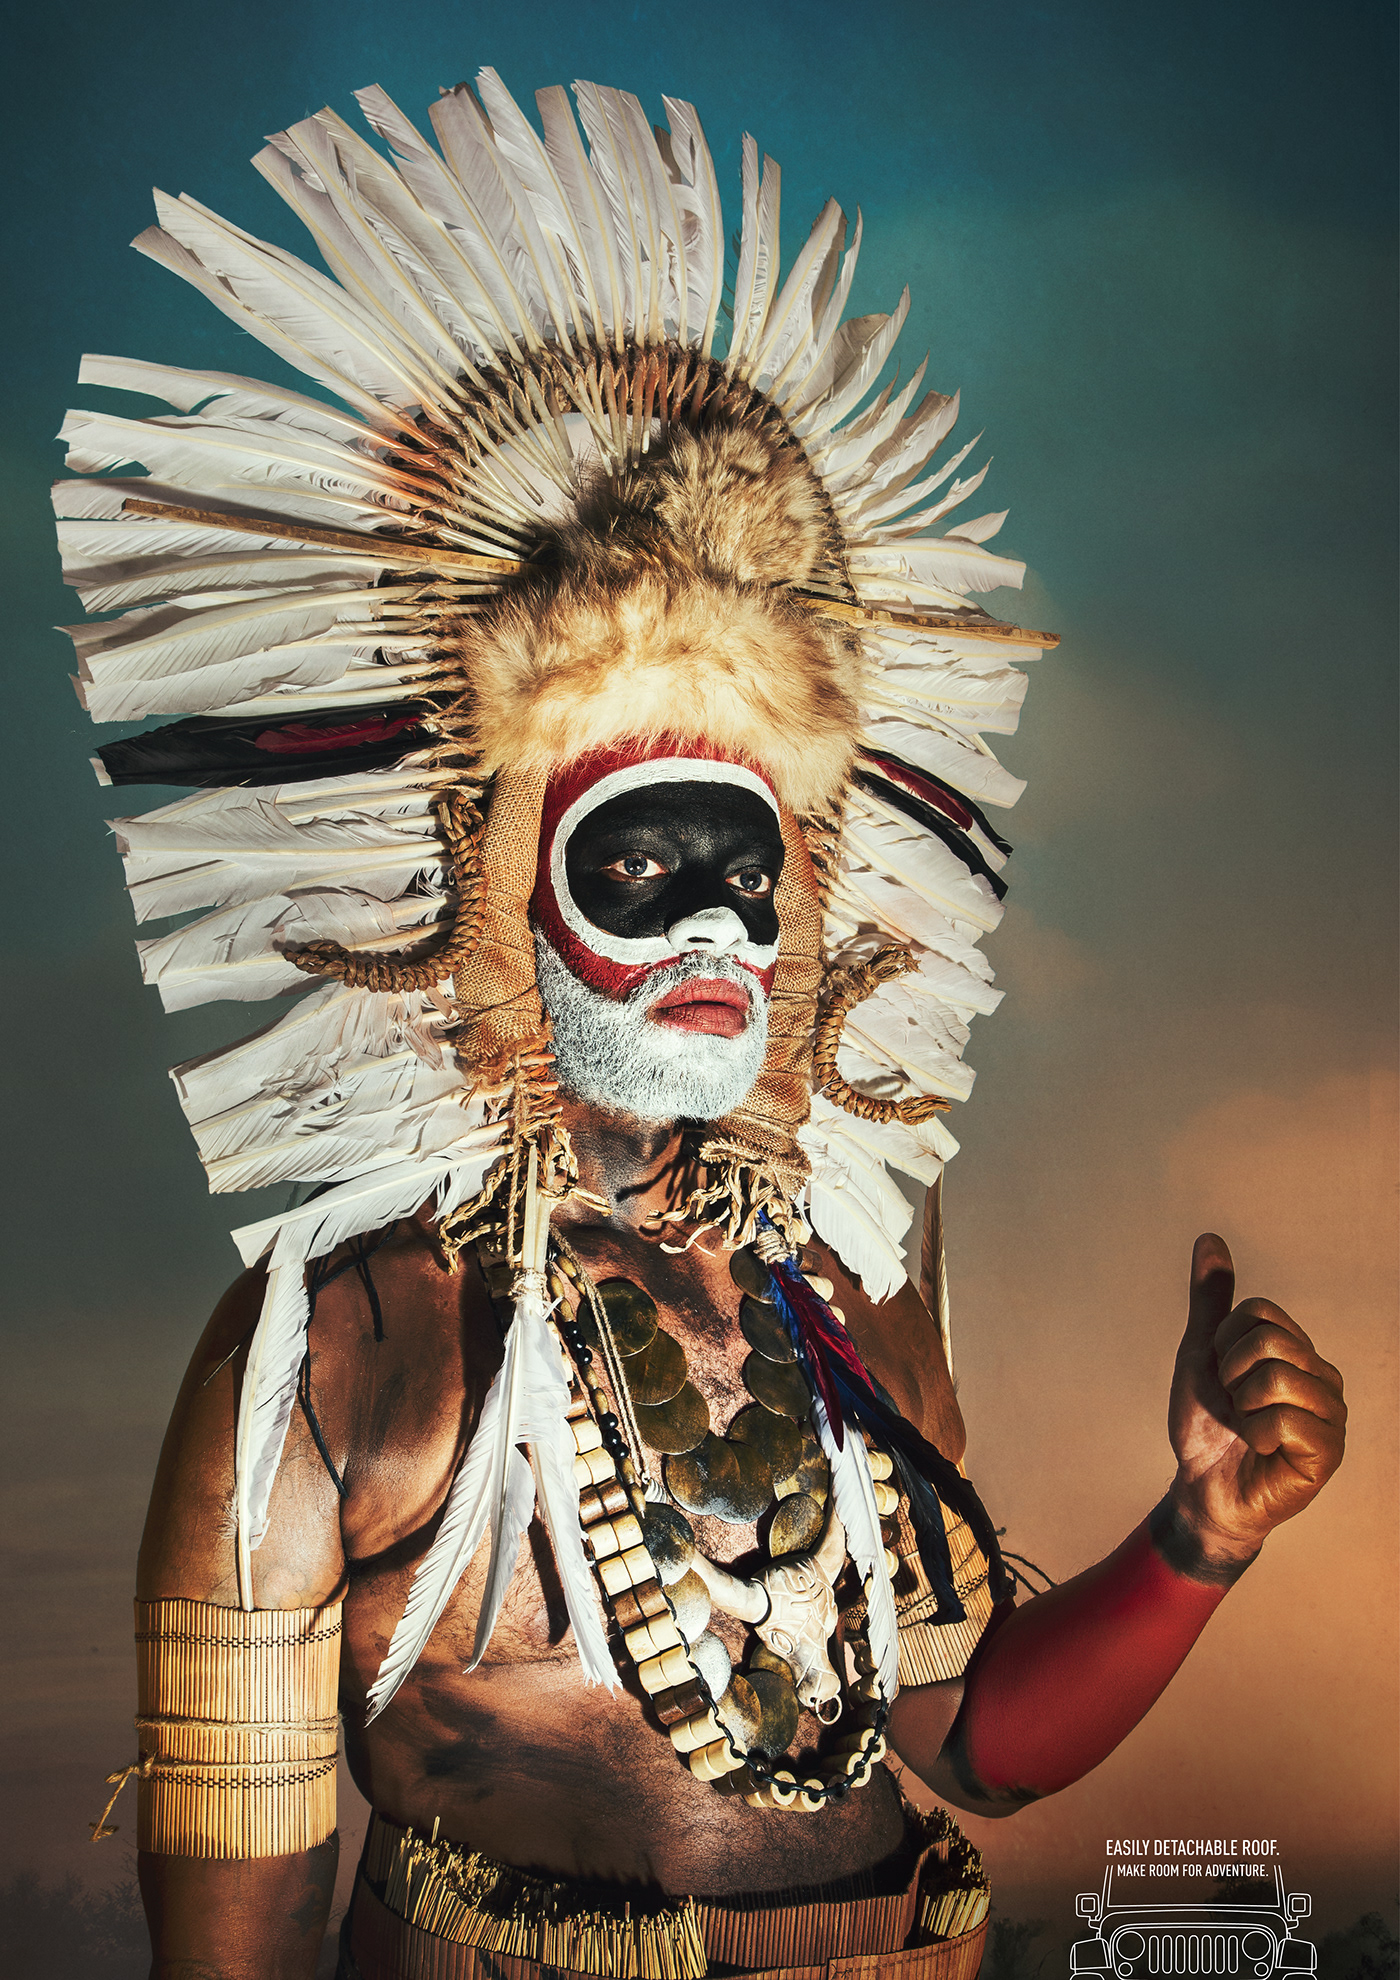 jeep,Wrangler,tribes,automobiles,Photography ,automotive